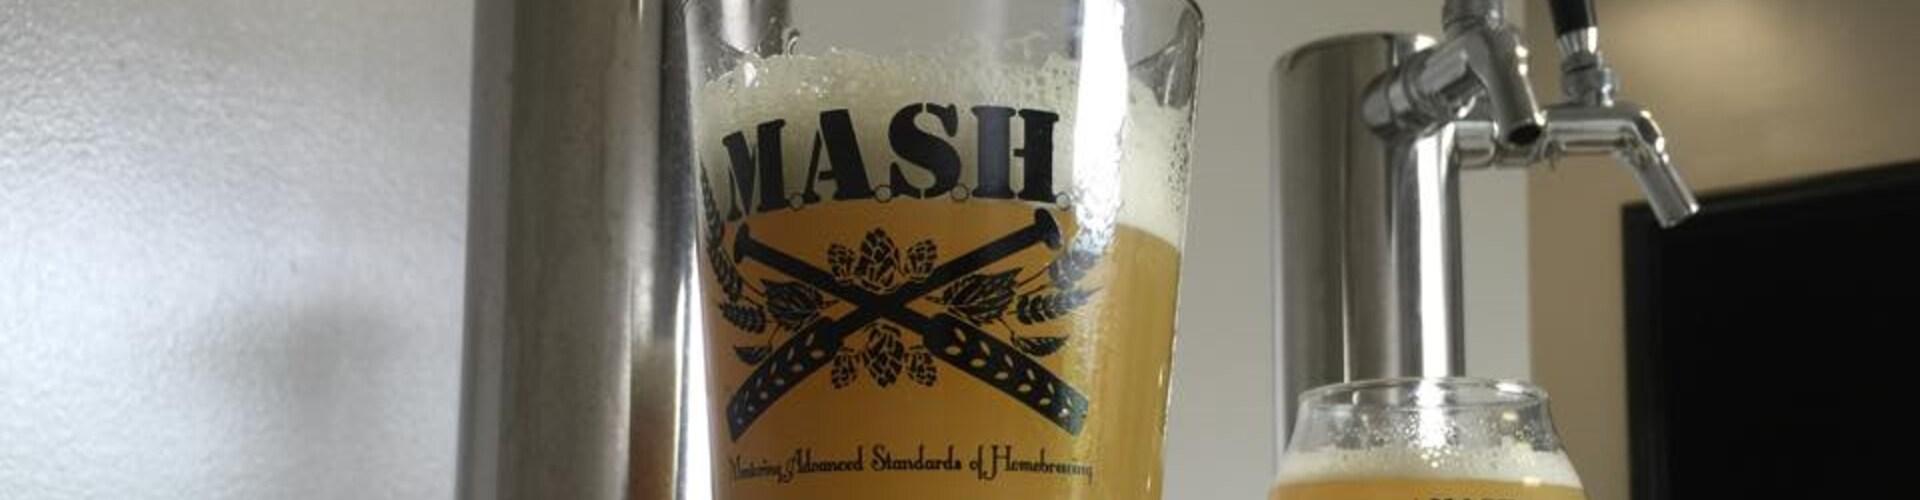 Mash card image1a